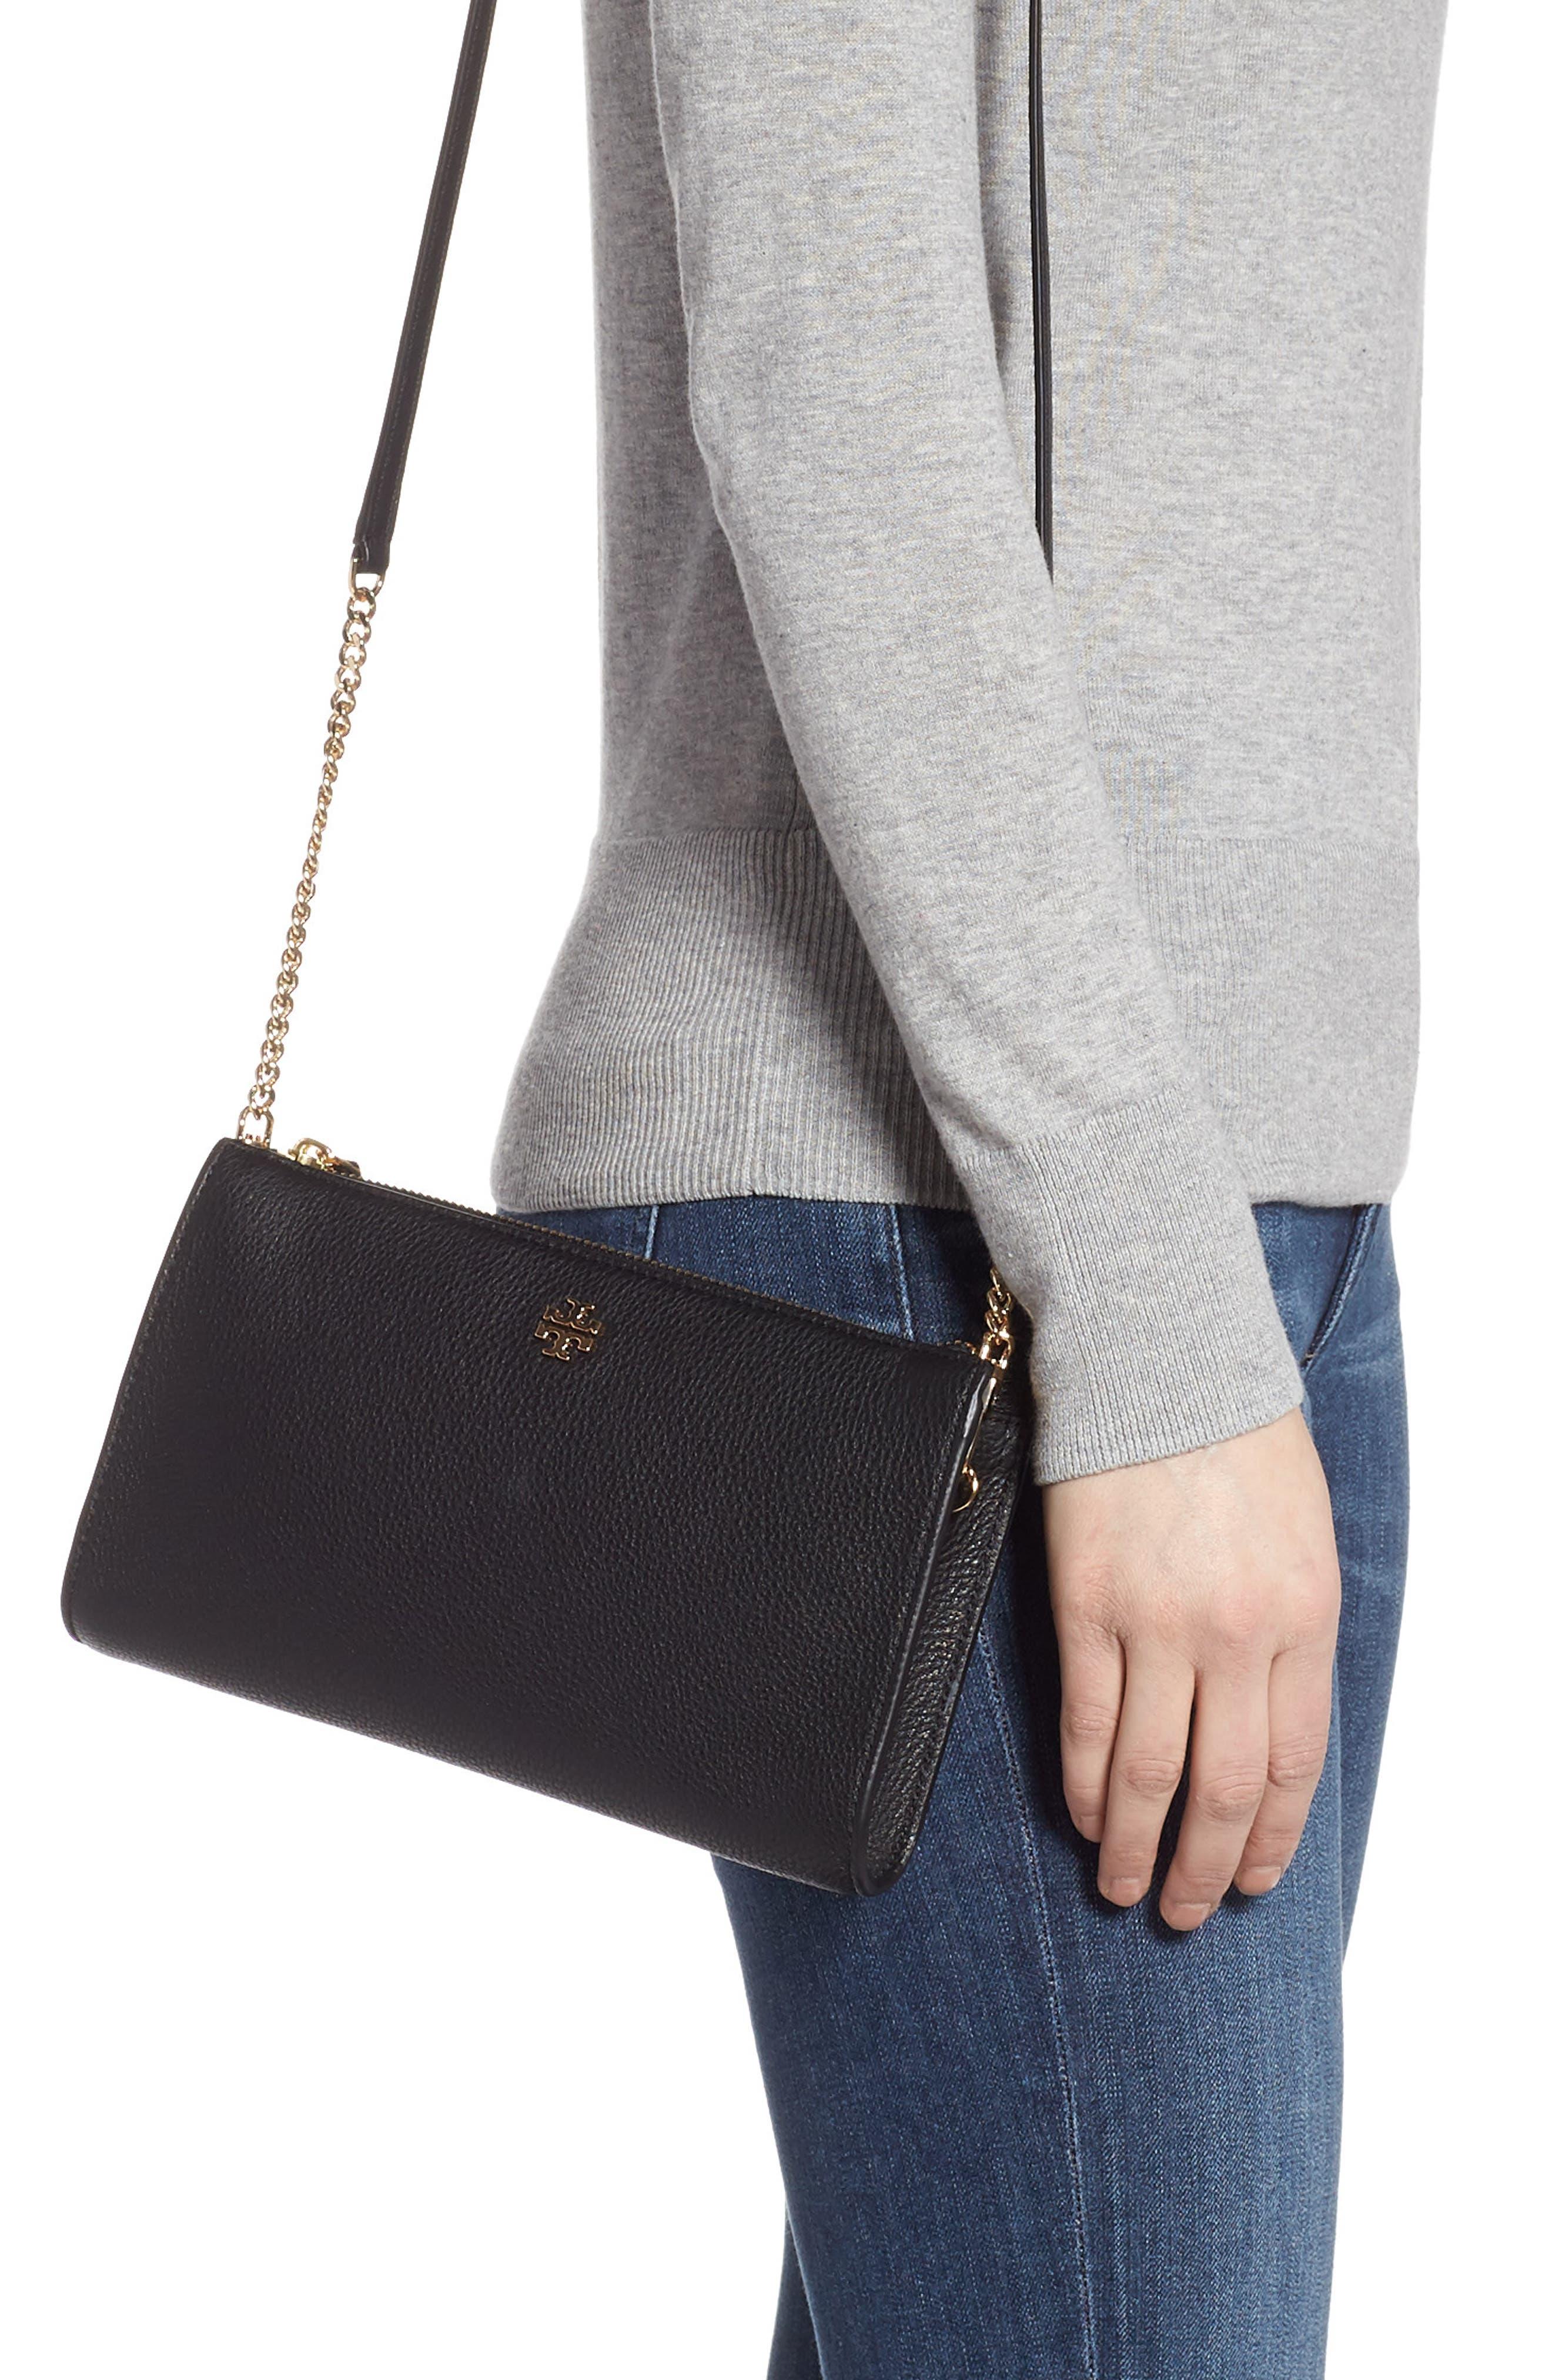 TORY BURCH,                             Pebbled Leather Top Zip Crossbody Bag,                             Alternate thumbnail 2, color,                             BLACK